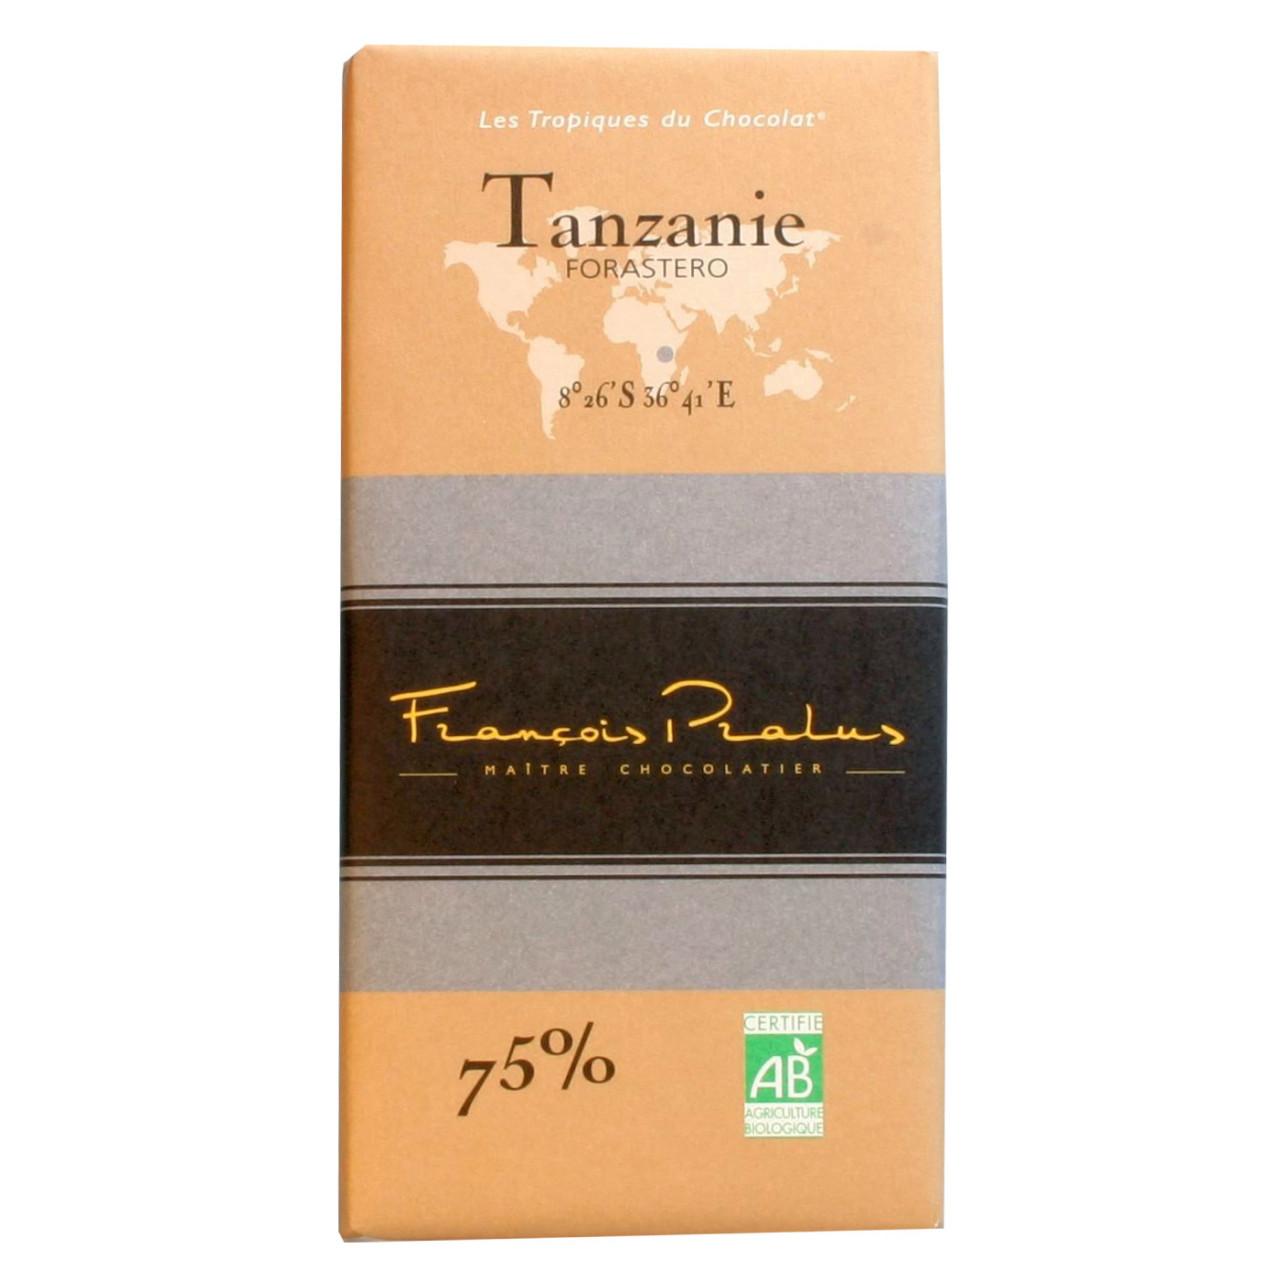 Pralus Frankreich dunkle Schokolade 75% Tansania Trinitario dark chocolate chocolat noir Afrika Africa Afrique                                                                                           - Tavola di cioccolato, cioccolato senza glutine, cioccolato senza lattosio, vegan-cordiale, Francia, cioccolato francese, Cioccolato con zucchero - Chocolats-De-Luxe